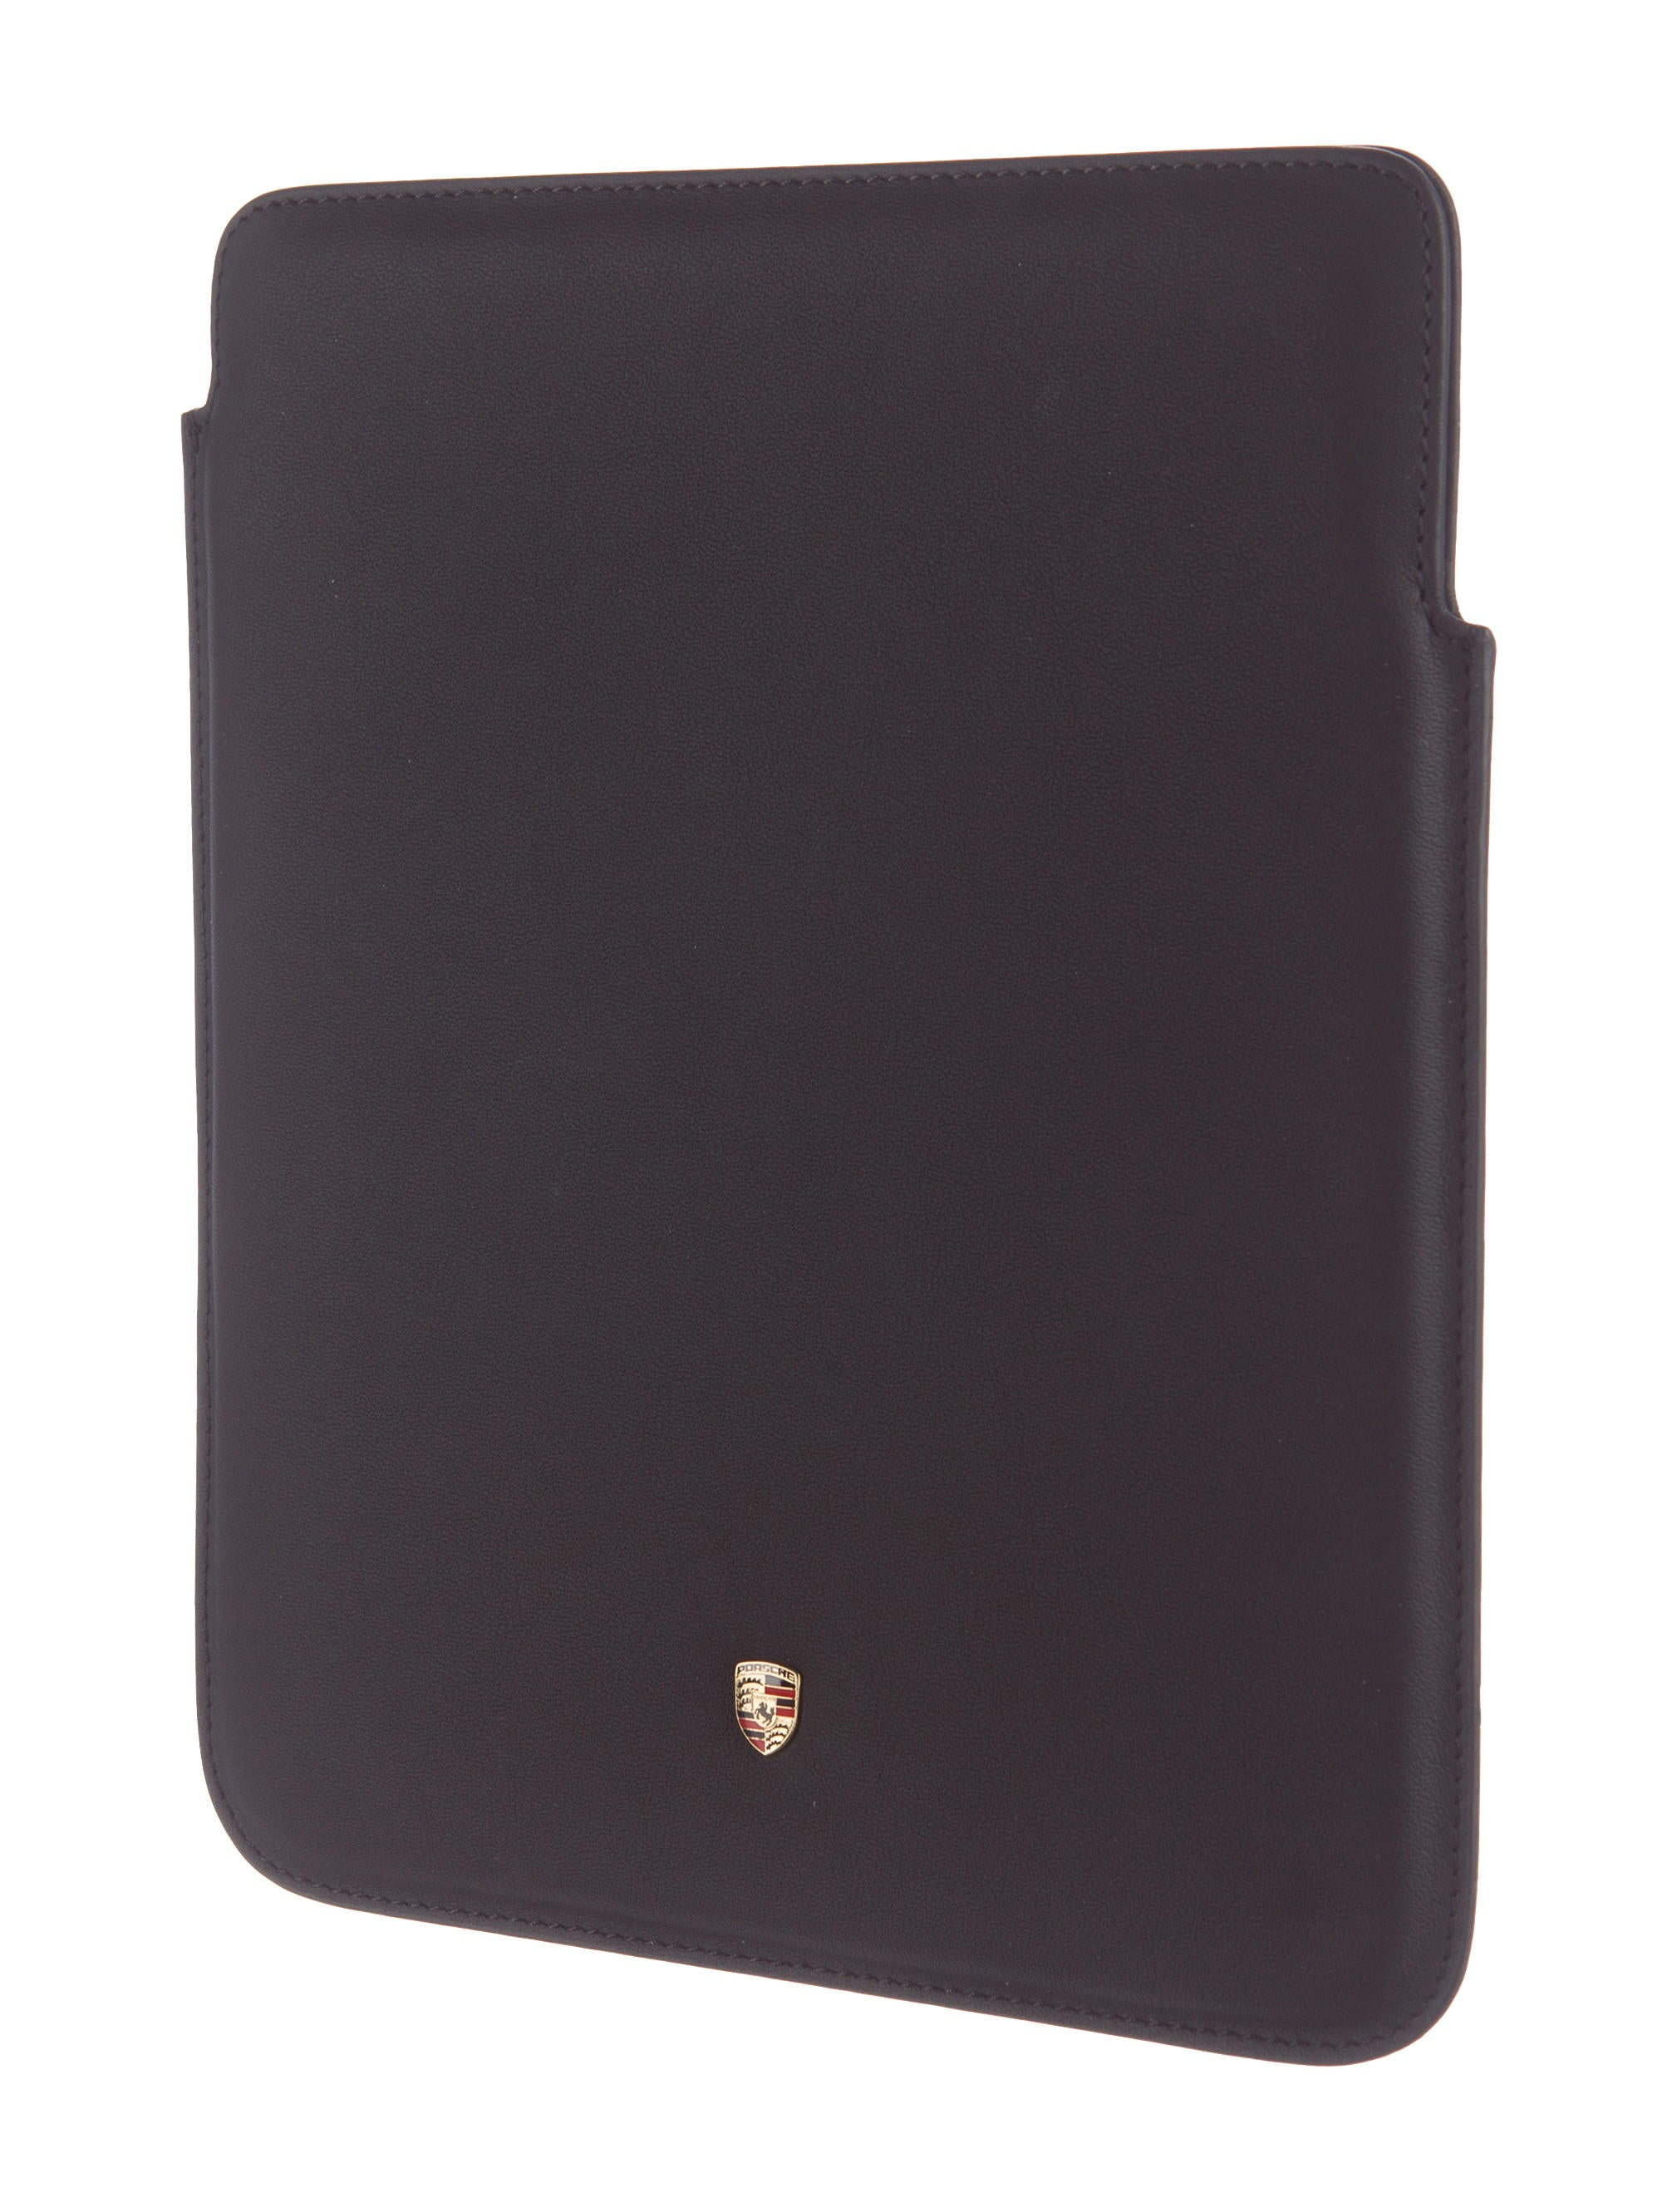 Porsche Design Leather iPad Air Case - Technology ...